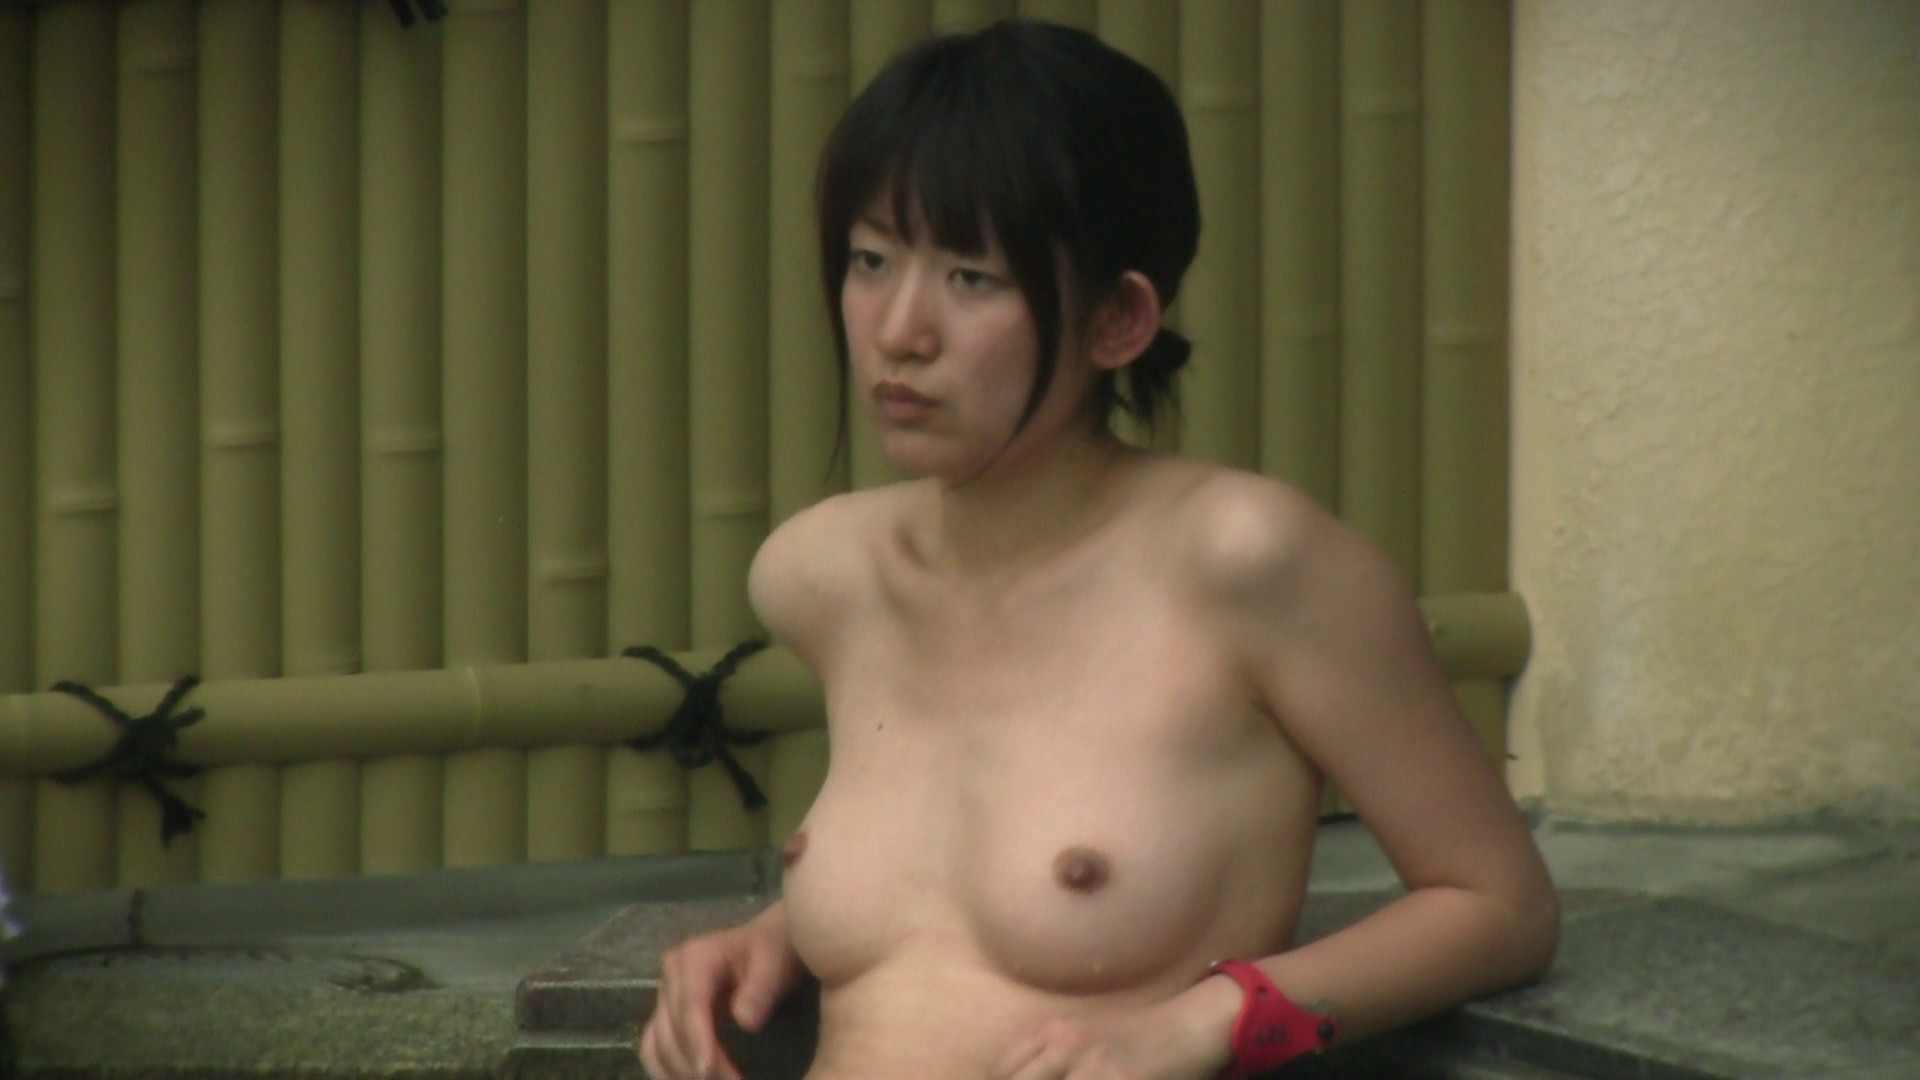 Aquaな露天風呂Vol.144 盗撮 | HなOL  93pic 11